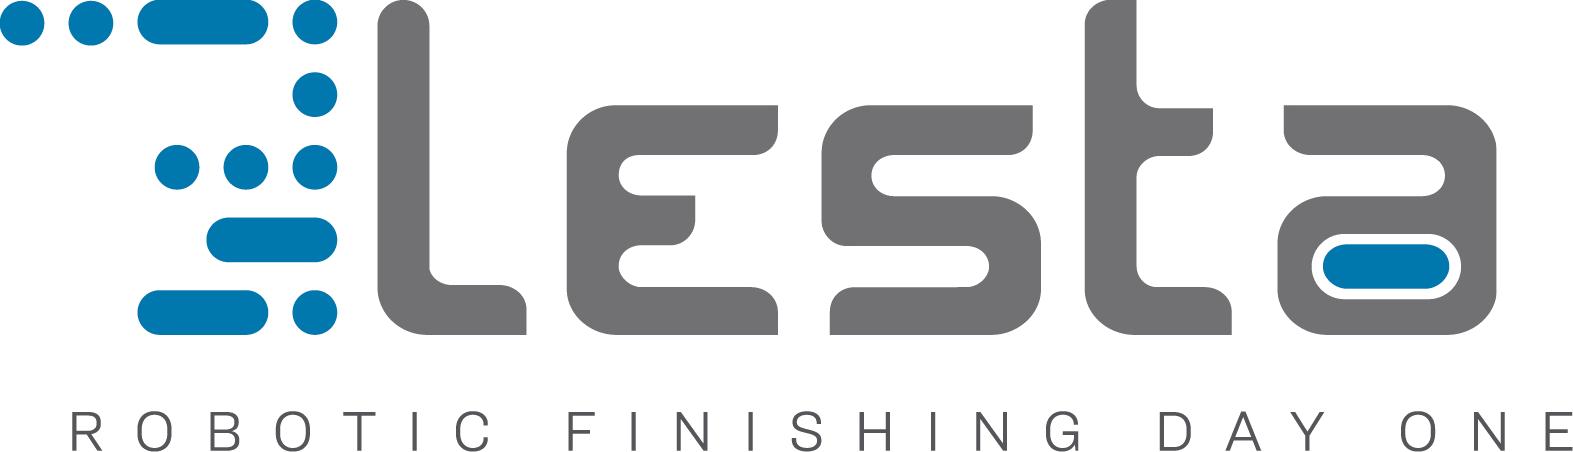 lesta_tagline_logo